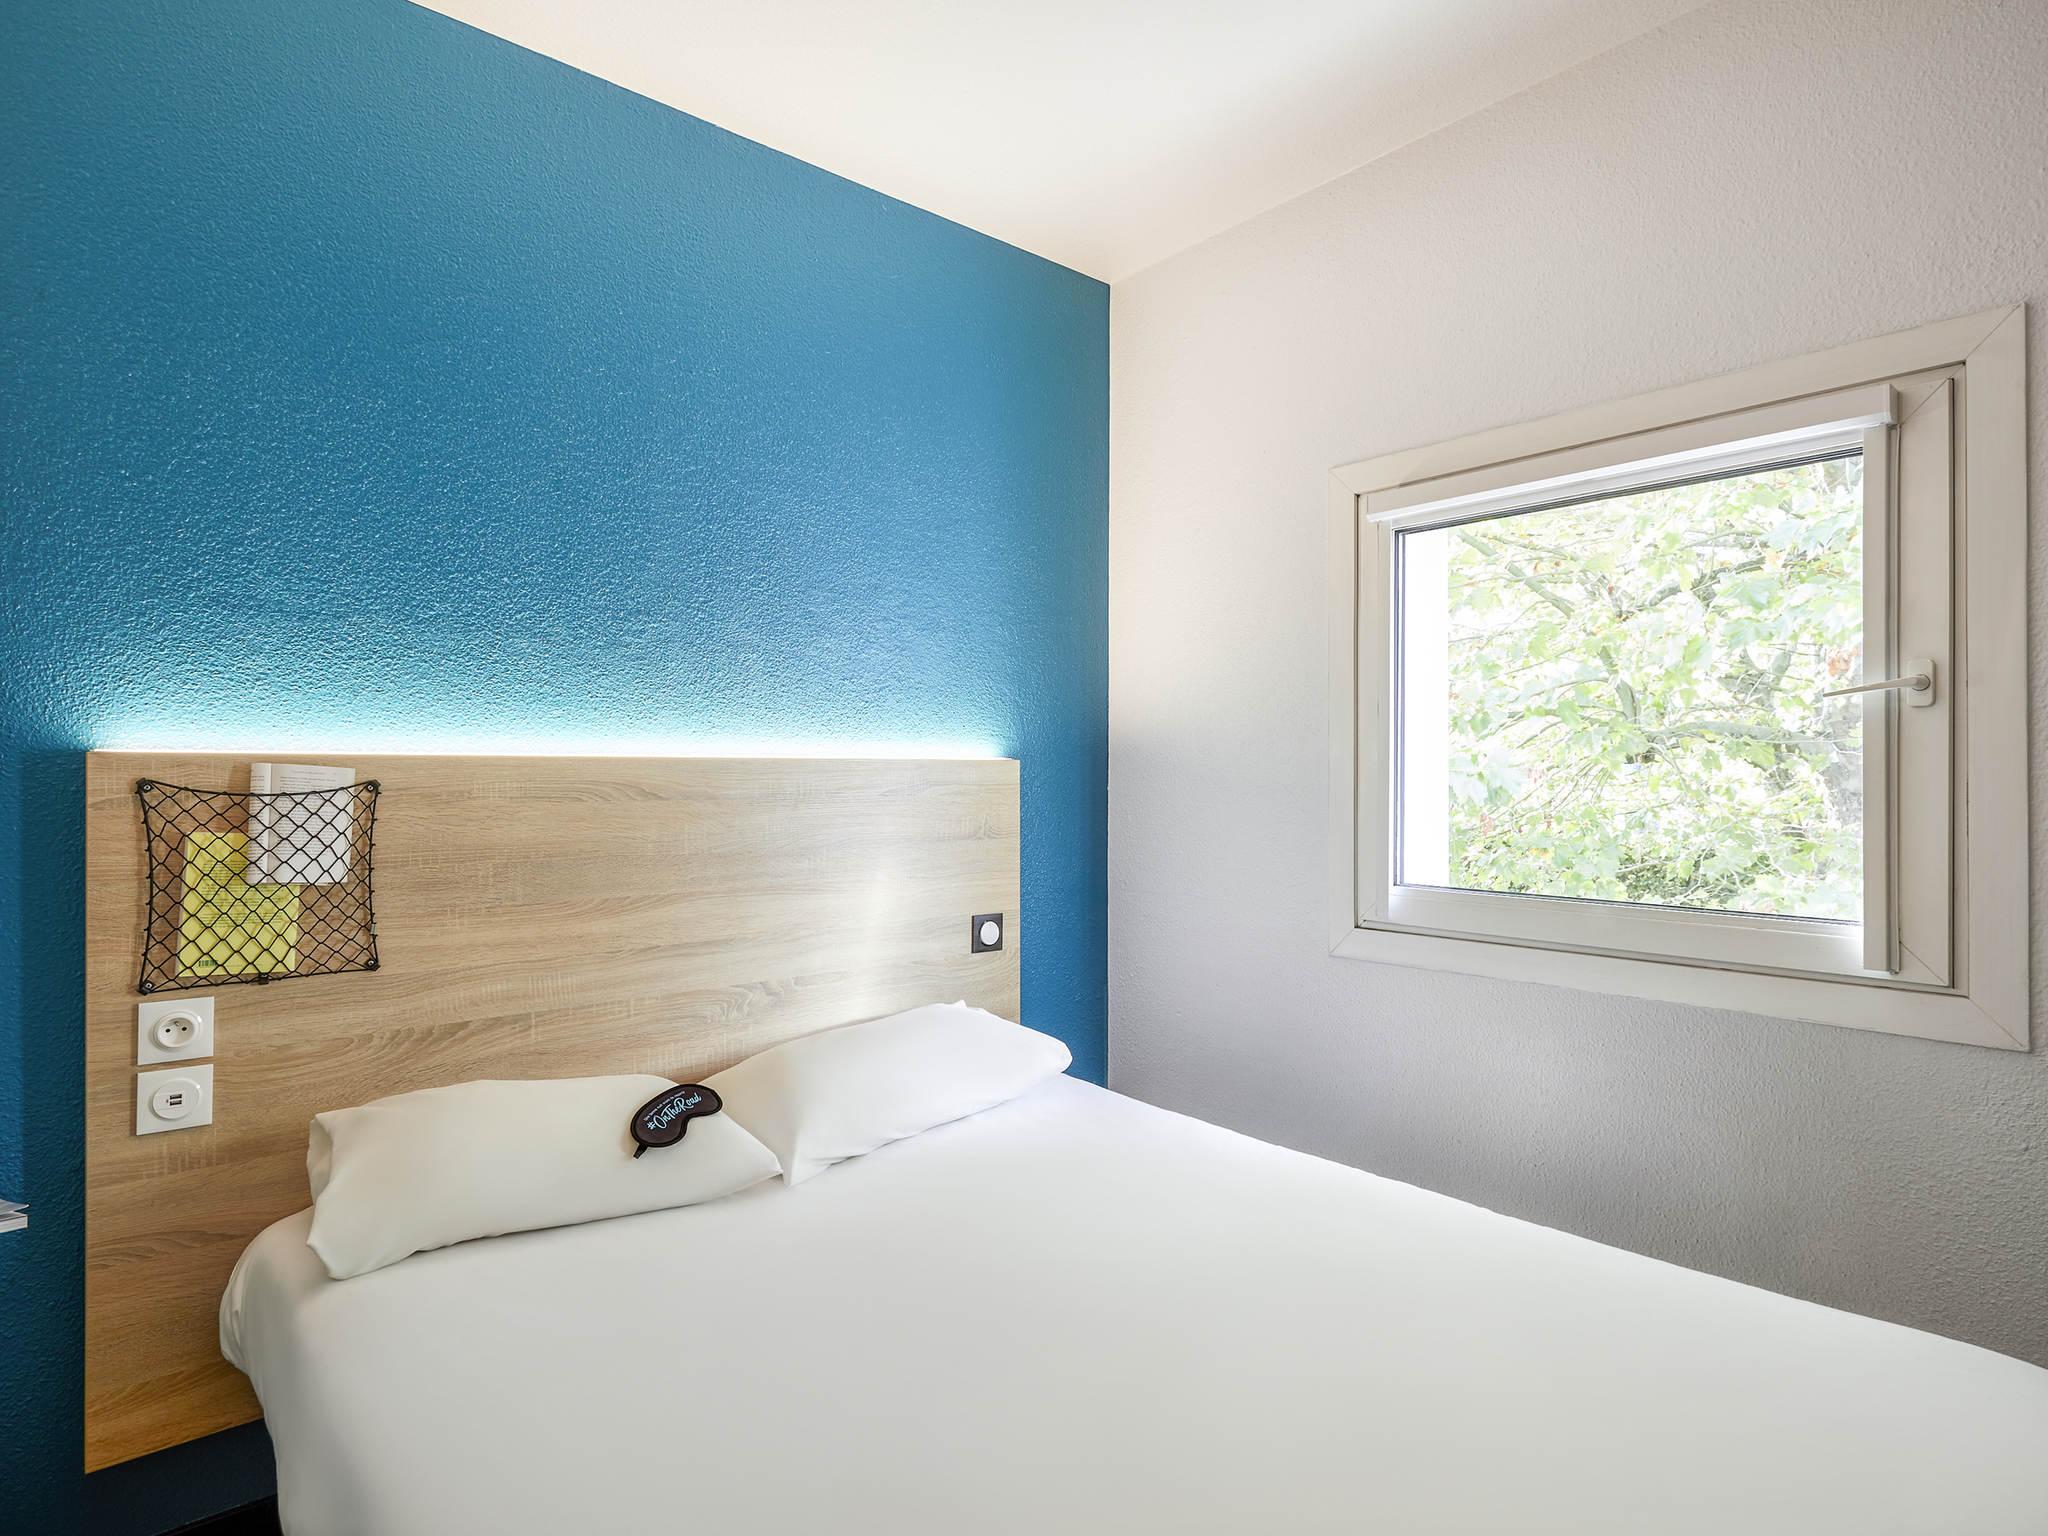 Hotell – hotelF1 Lyon Saint-Priest (rénové)